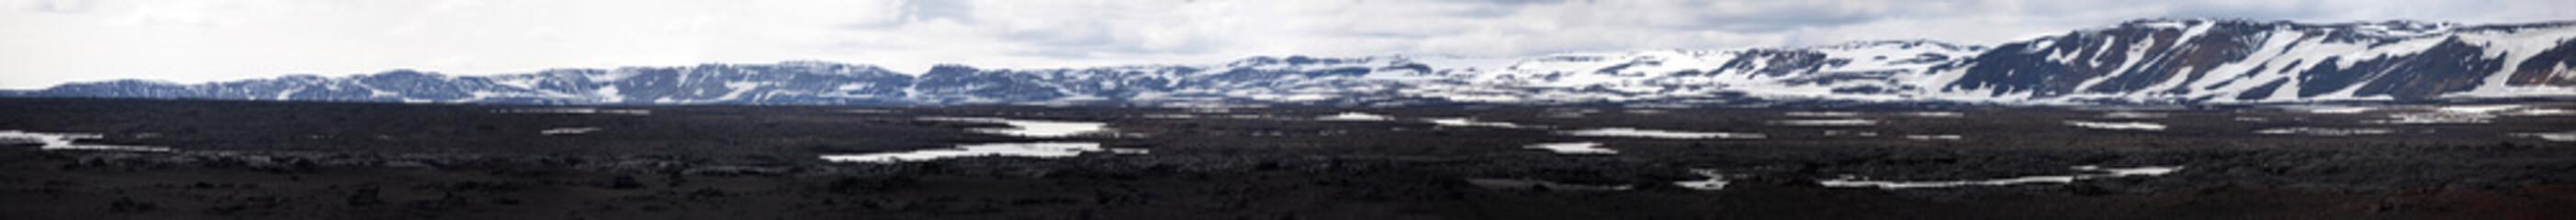 Askja Caldera vulcanica